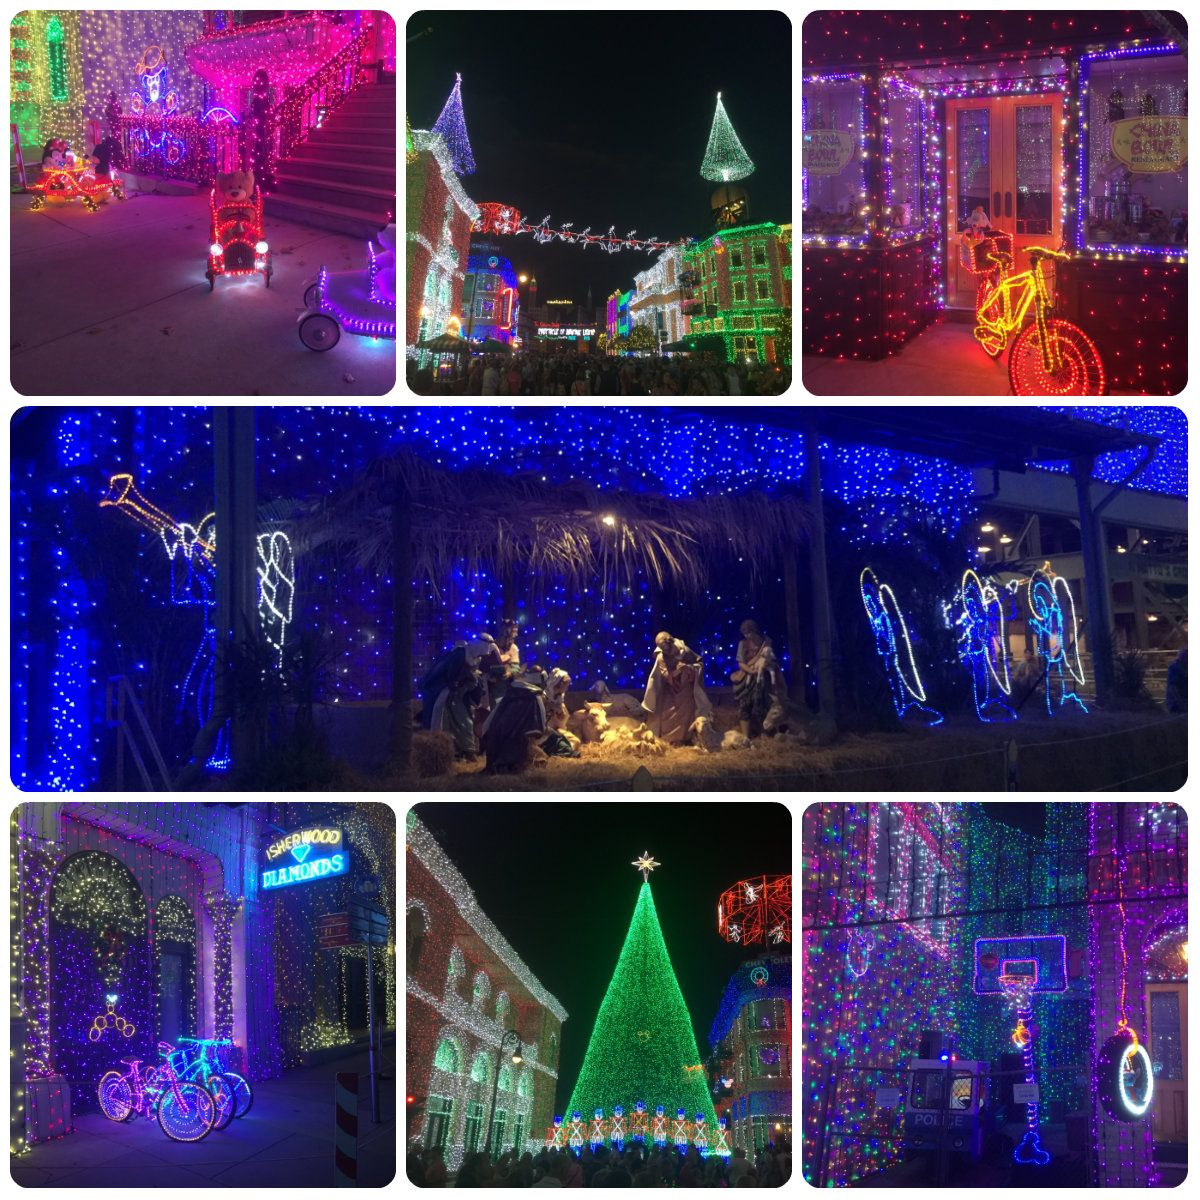 #HollywoodStudios #osbornelights #waltdisneyworld #christmas